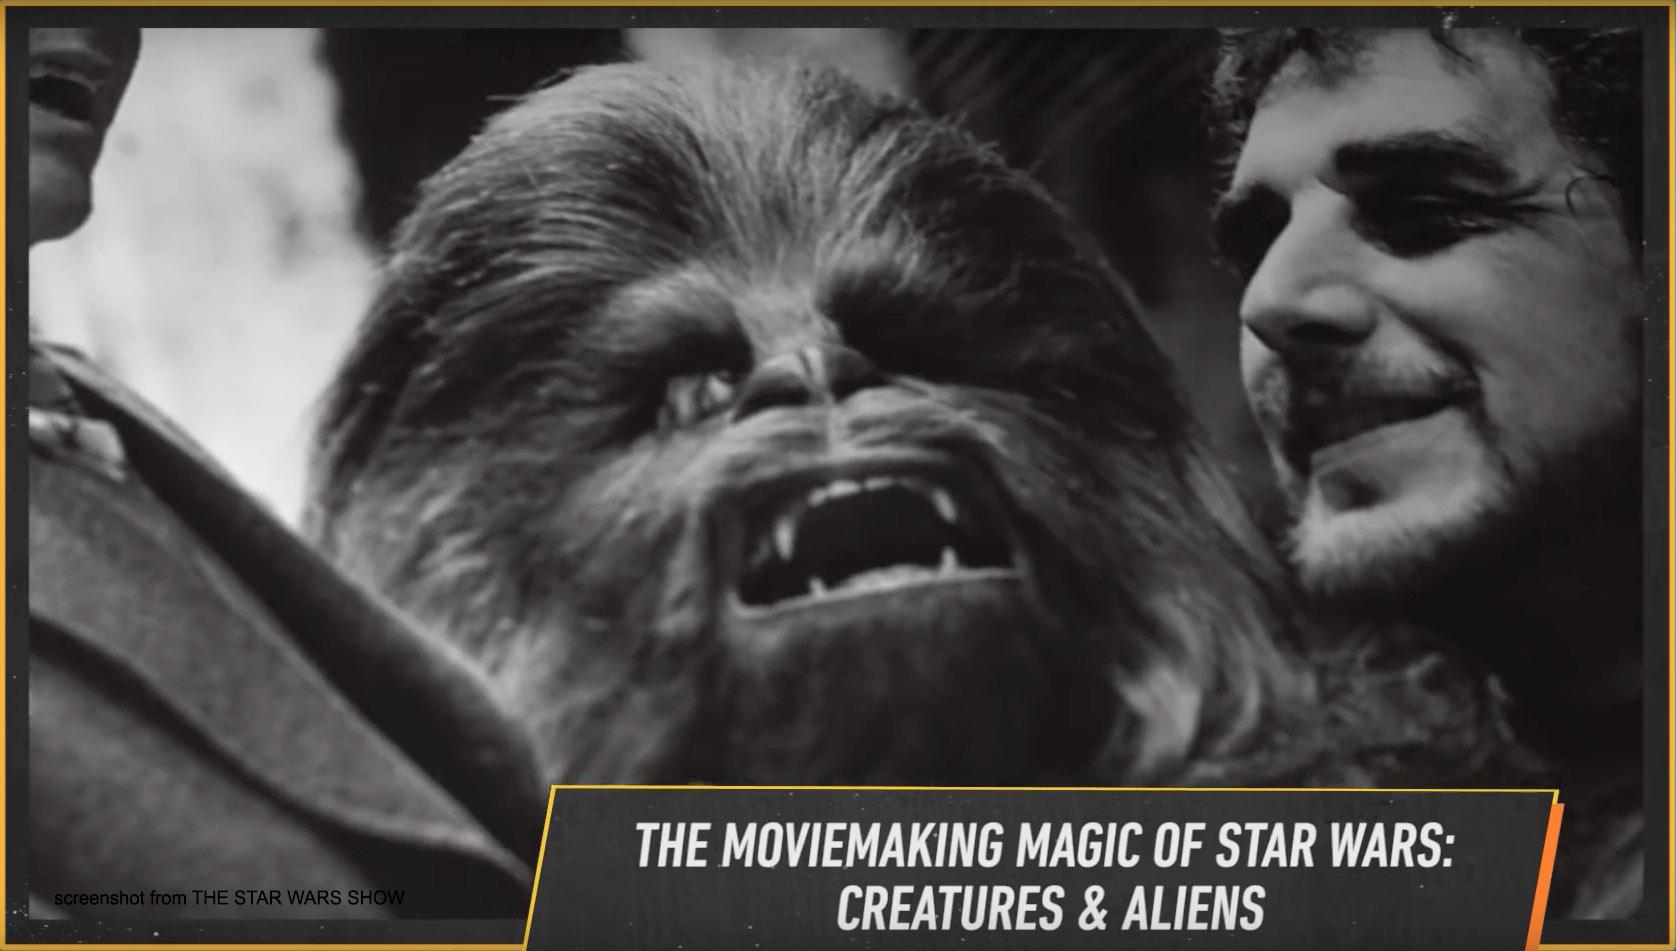 moviemaking-magic-star-wars-creatures-aliens-2 – Regal Robot